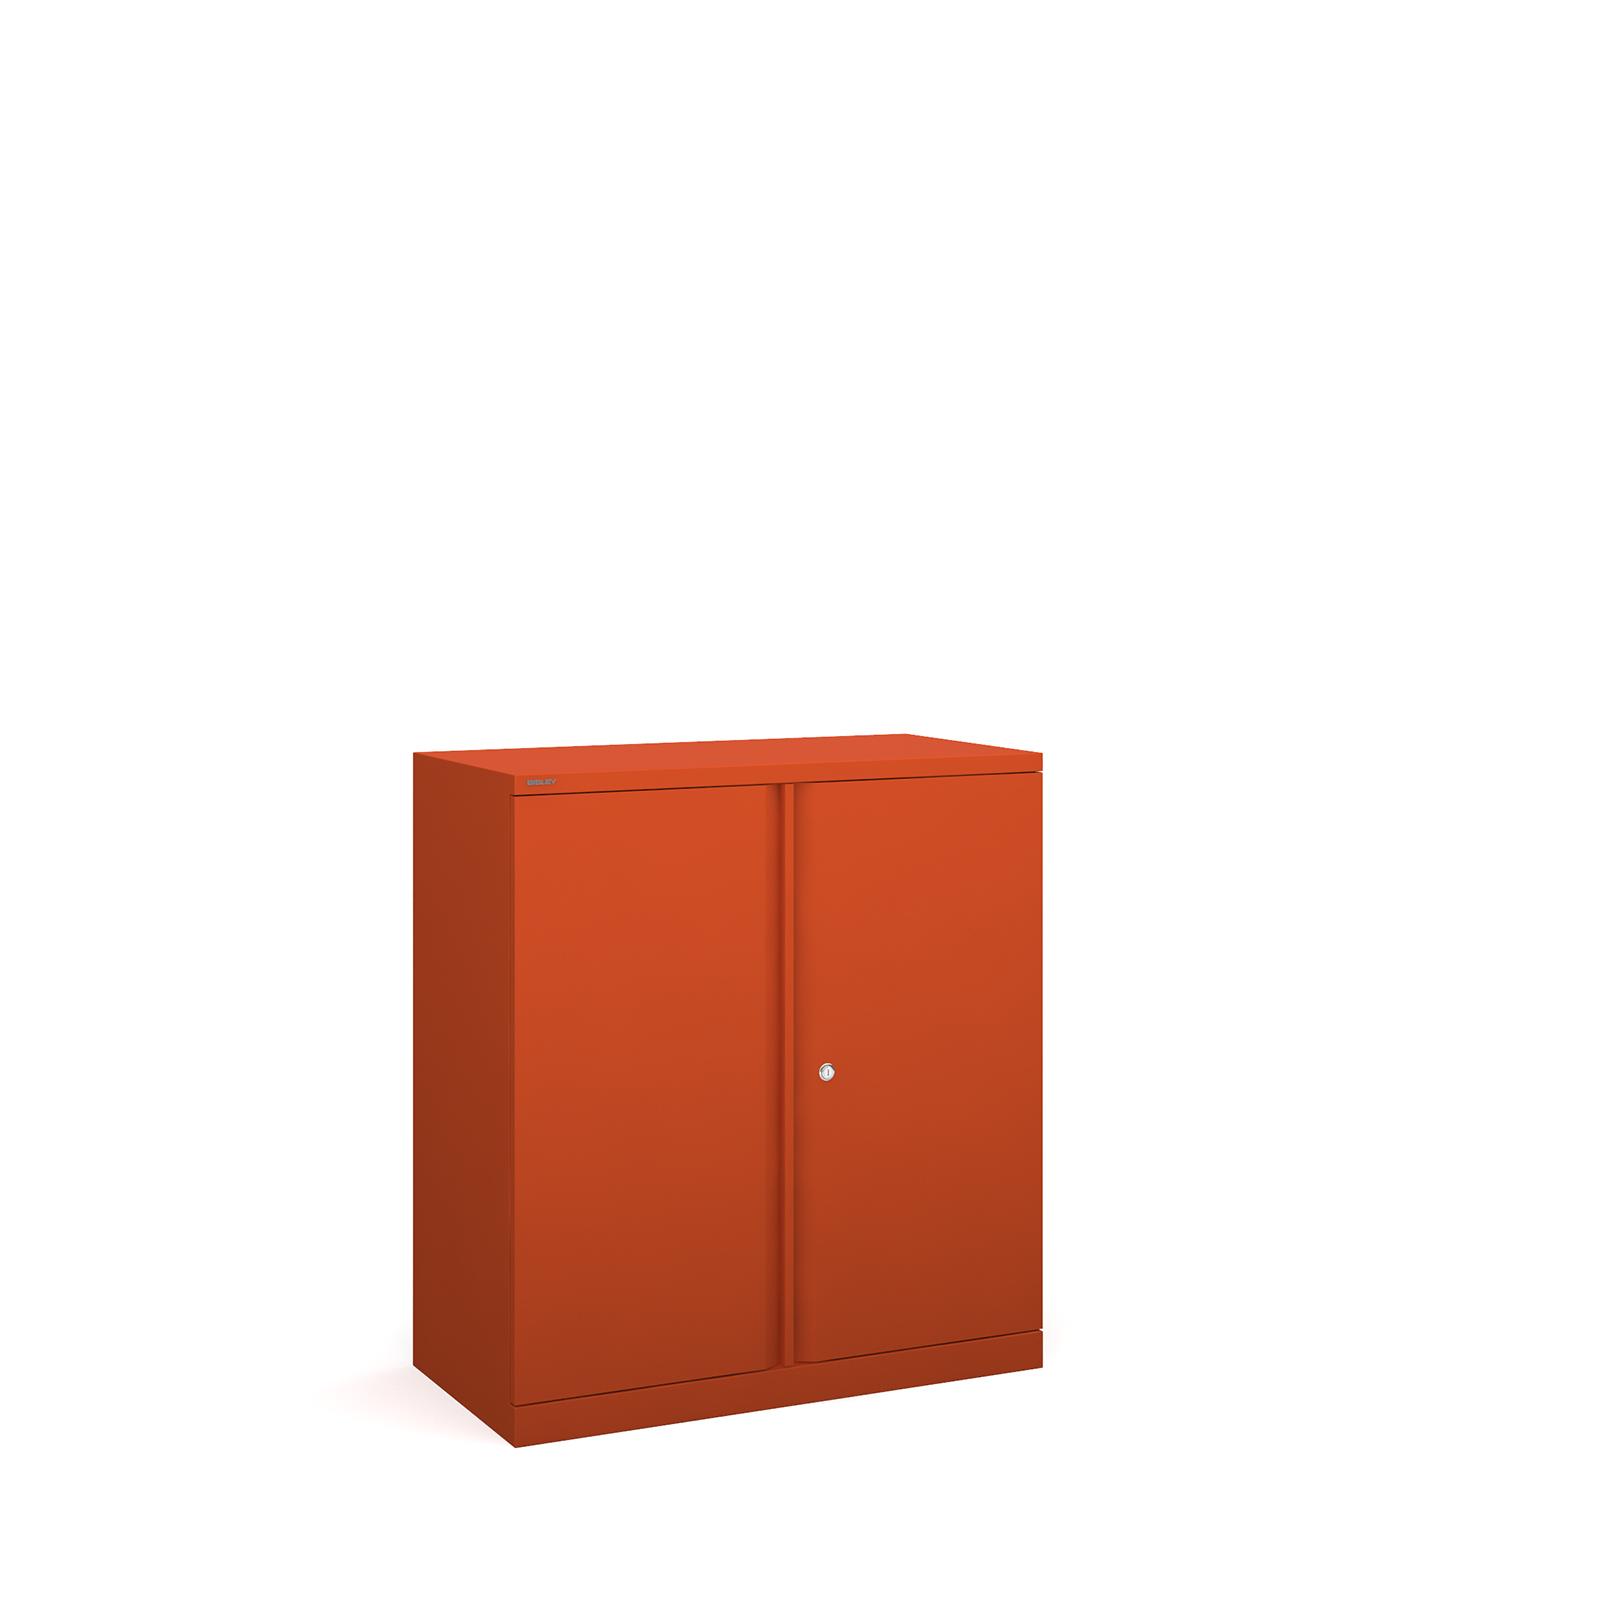 Bisley systems storage low cupboard 1000mm high - orange